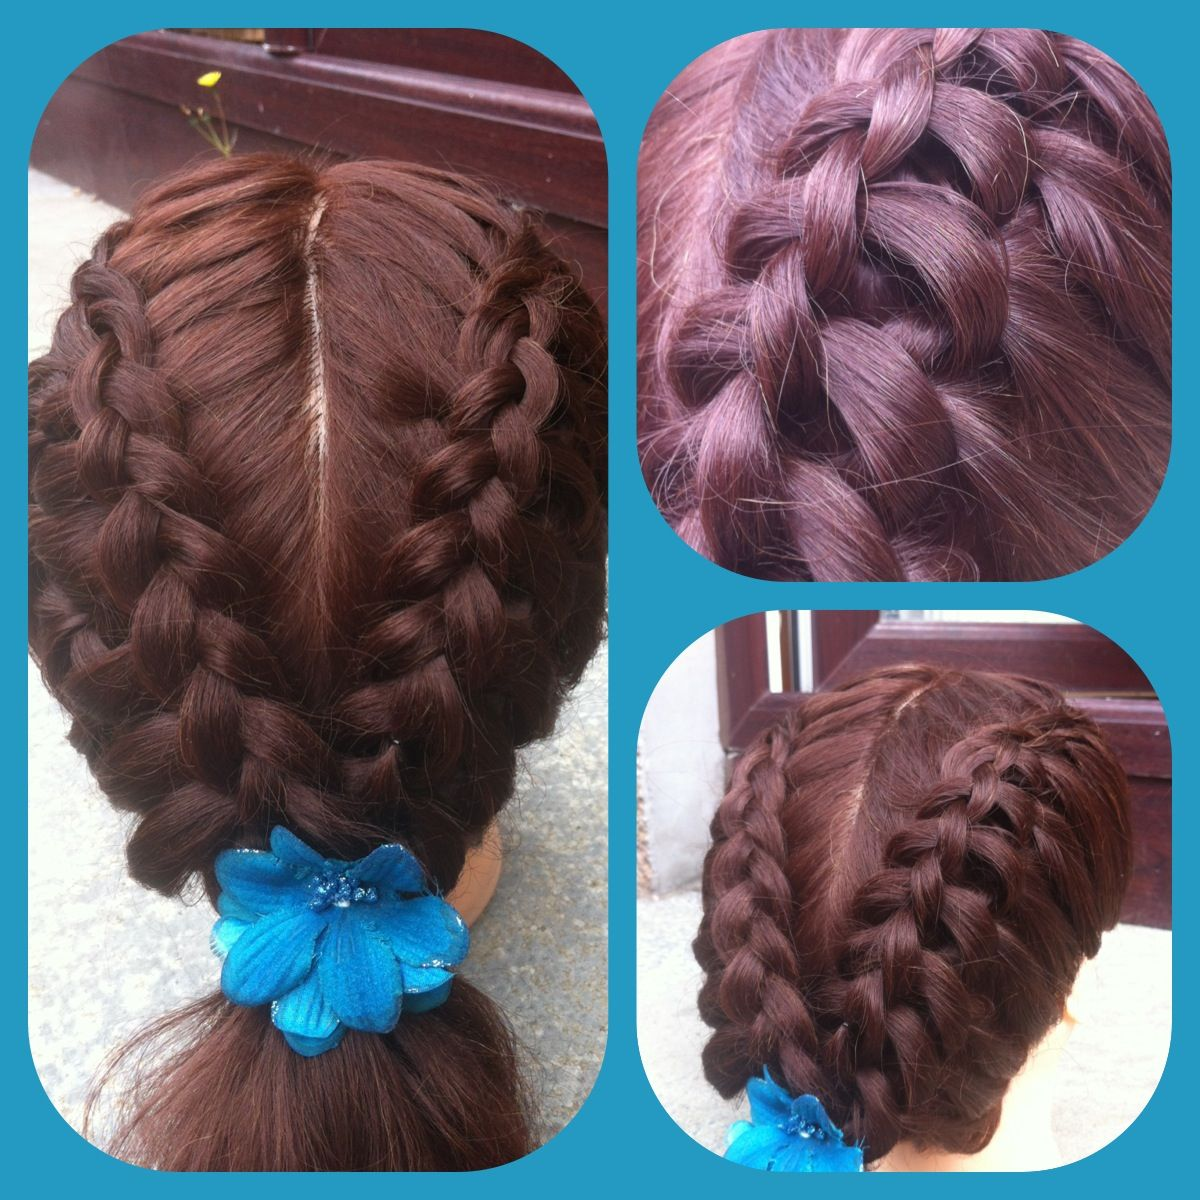 Braids hair styles braided hairstyles braids